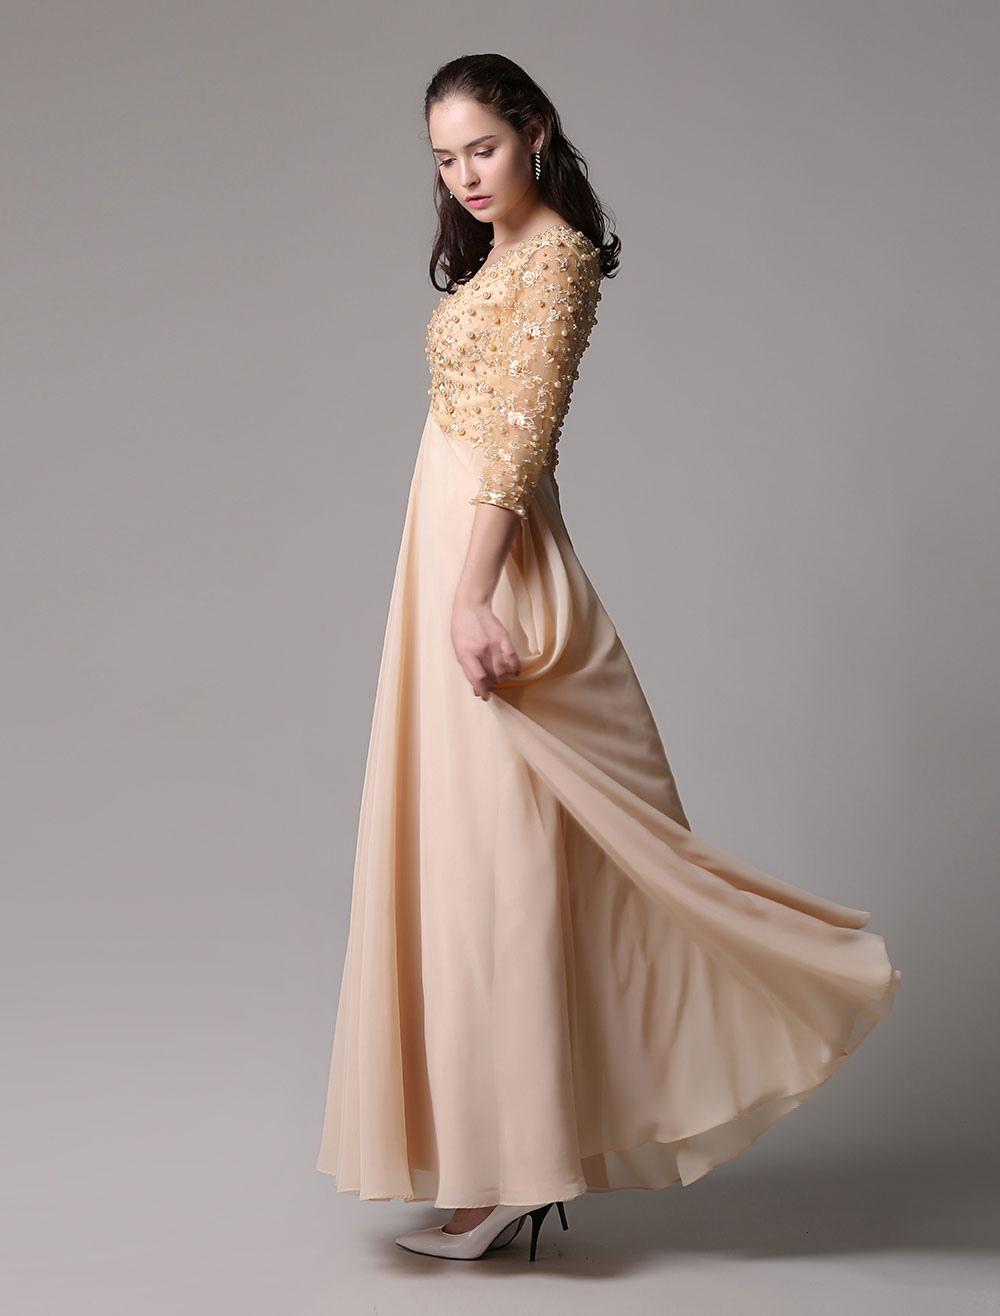 robe couleur champagne acheter robe couleur champagne aux petits prix. Black Bedroom Furniture Sets. Home Design Ideas